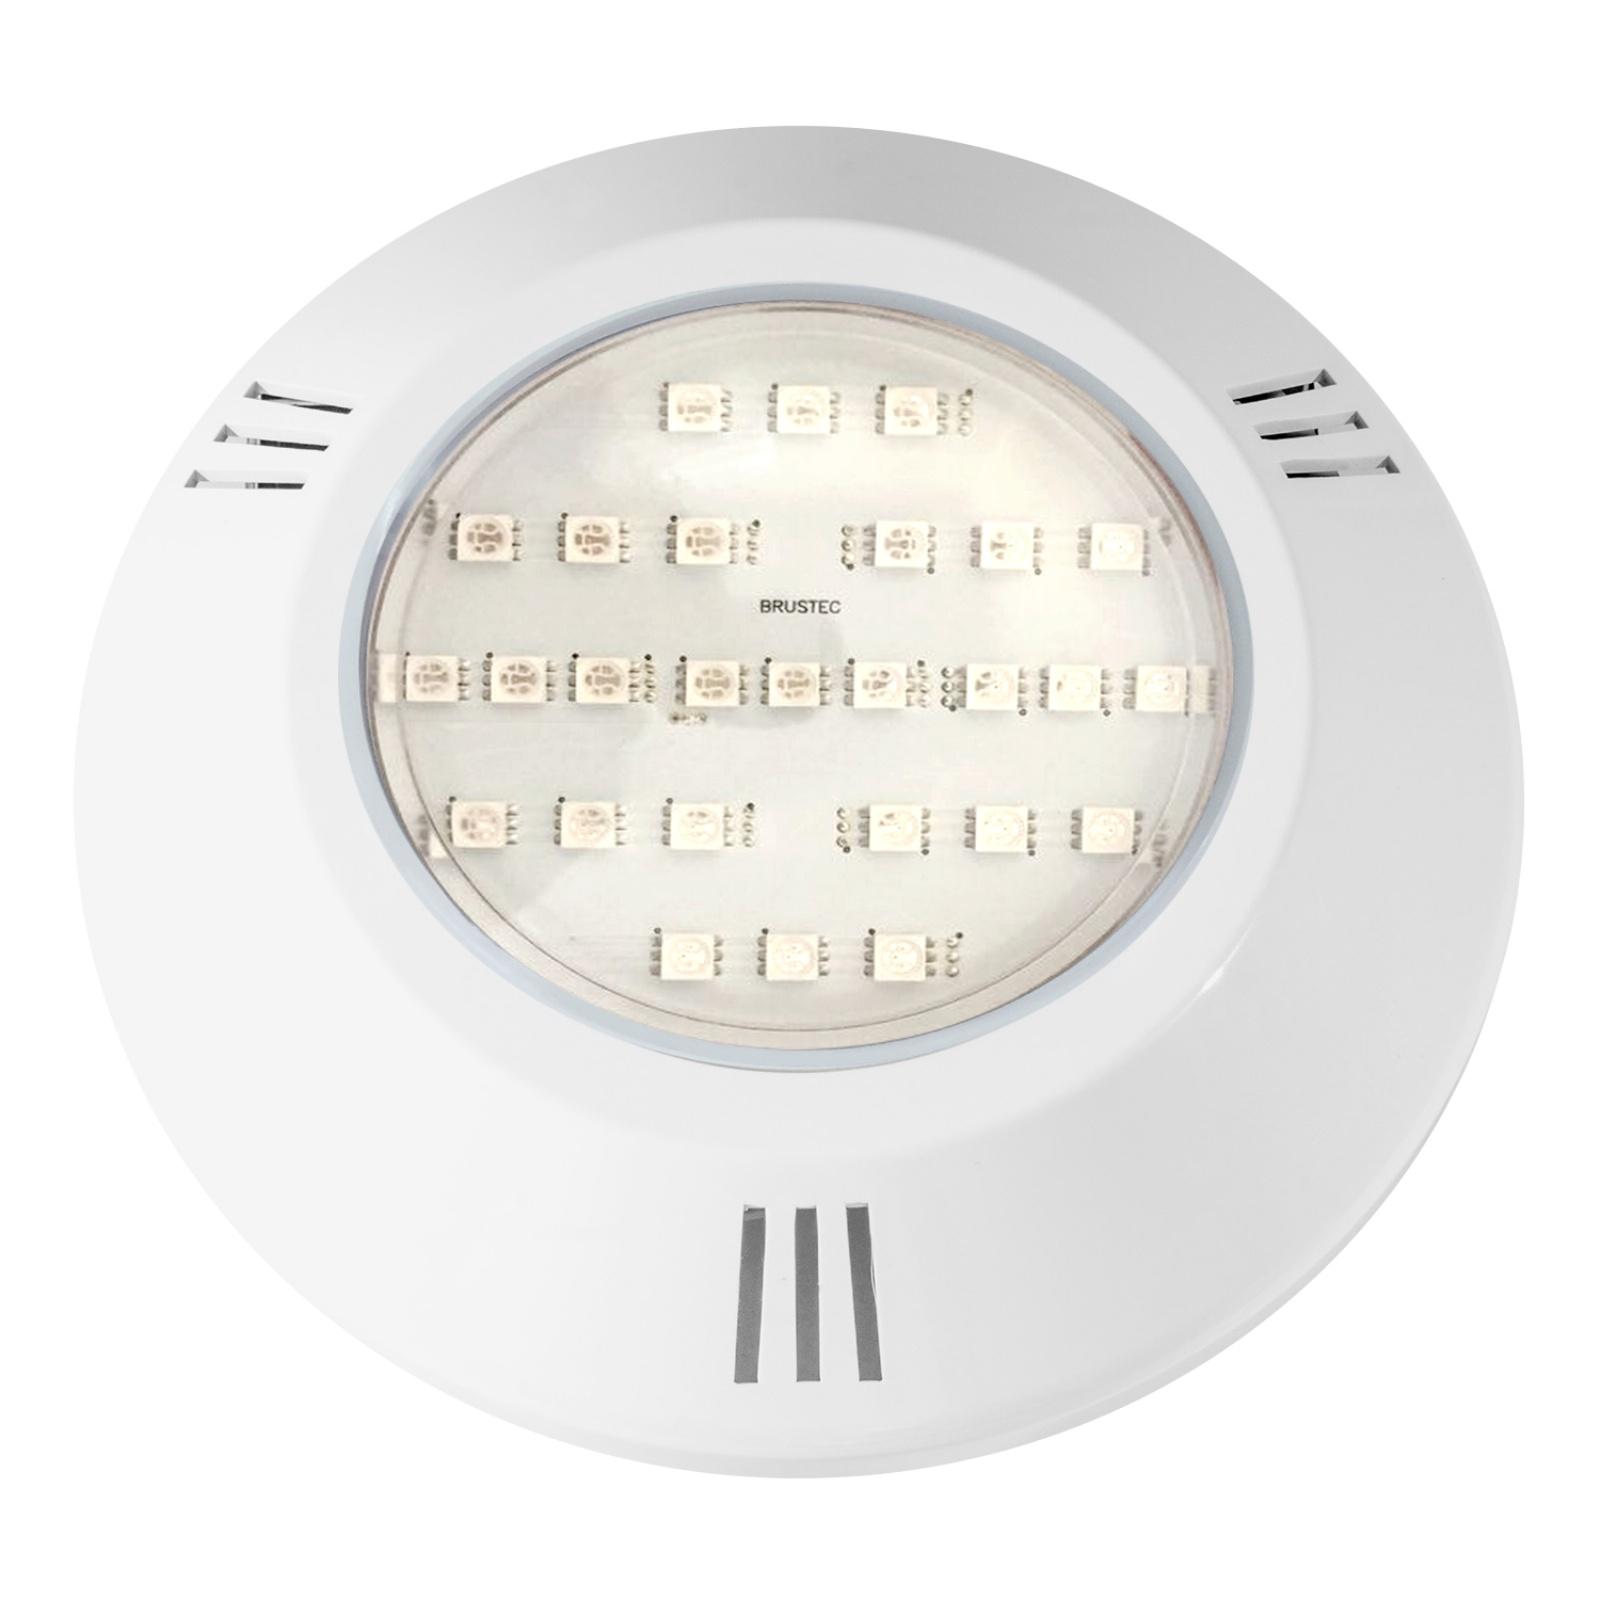 REFLETOR POWER LED 6W RGB - ABS FRENTE NEW BRUSTEC